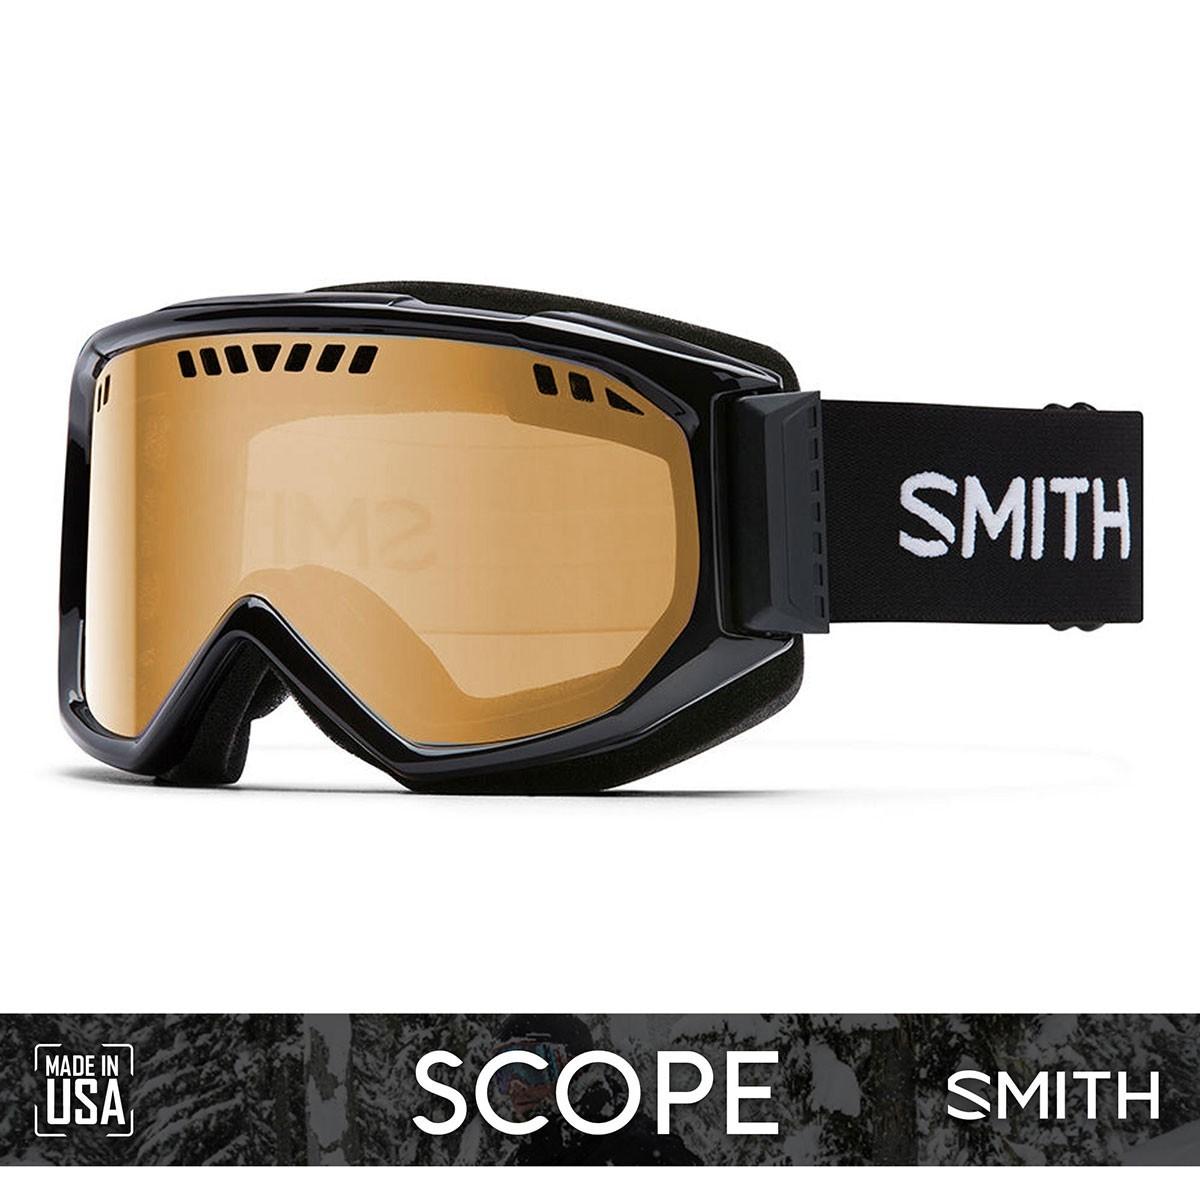 SMITH SCOPE Black | S3 RED SOL-X Mirror - Изображение - AQUAMATRIX